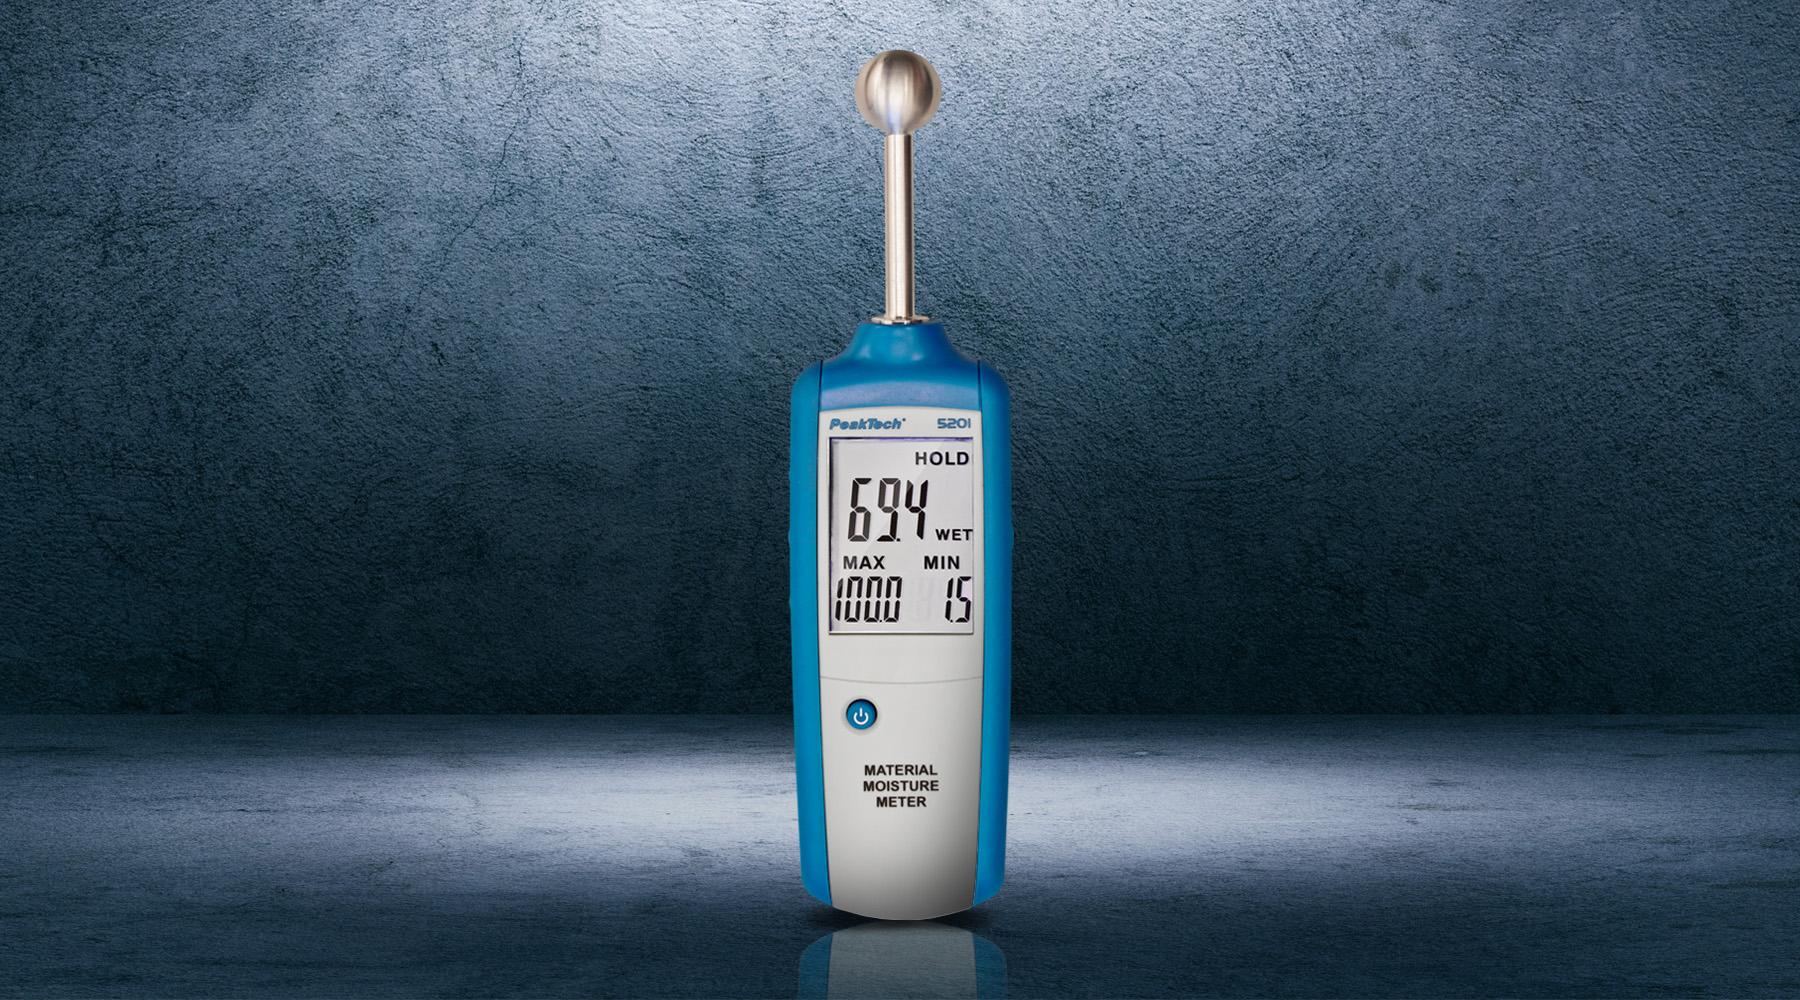 Building moisture meters